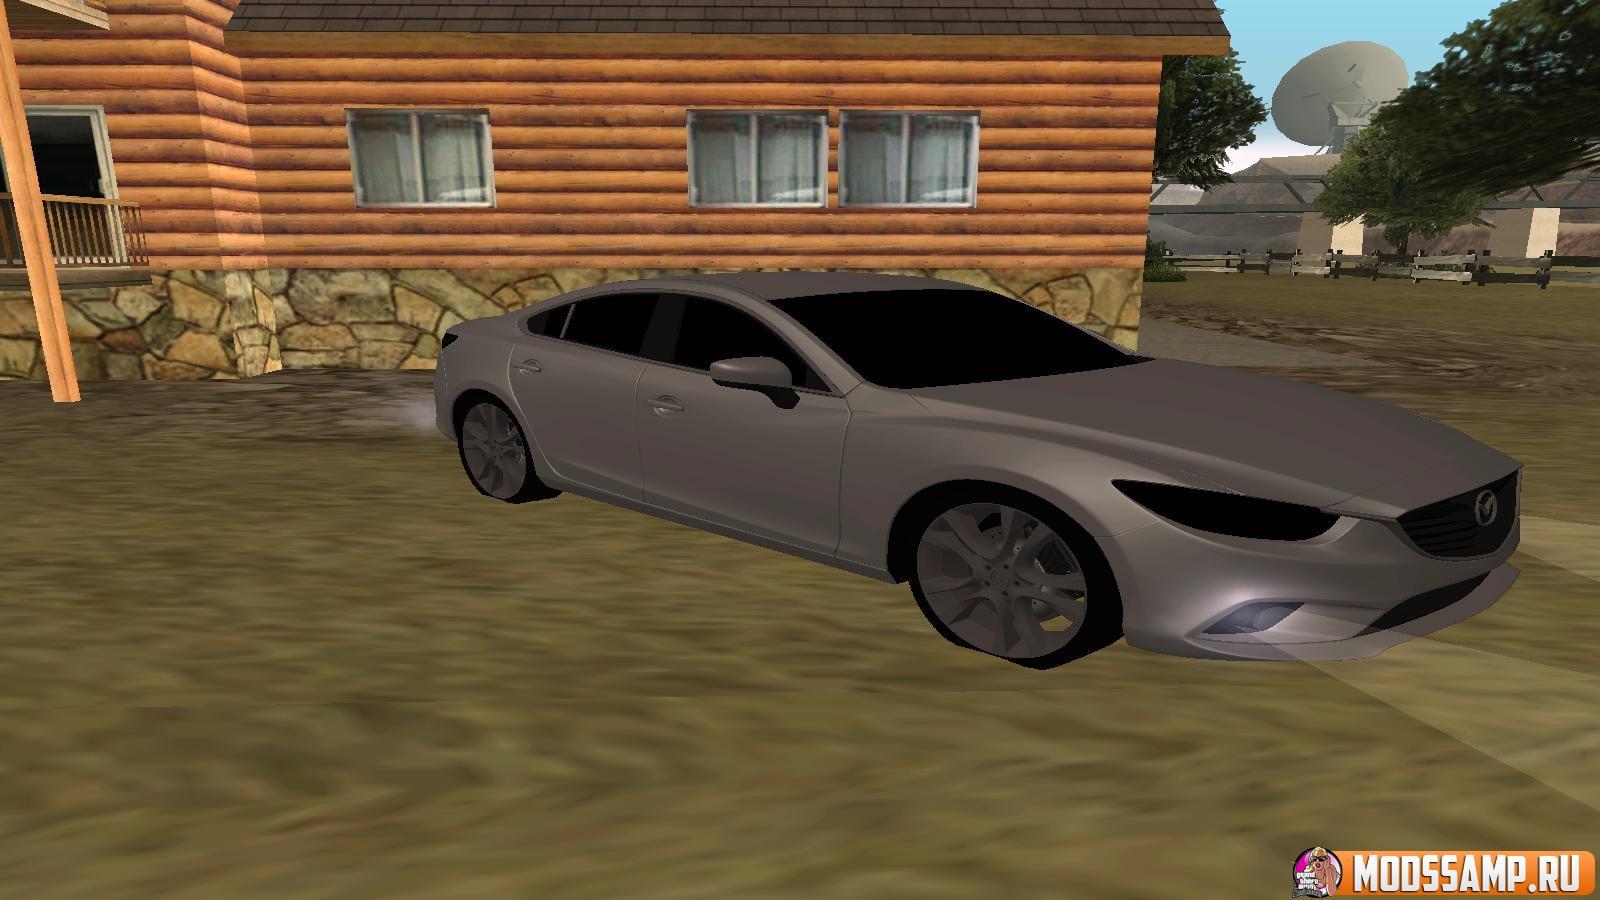 MAZDA 6 2013 для GTA:SA